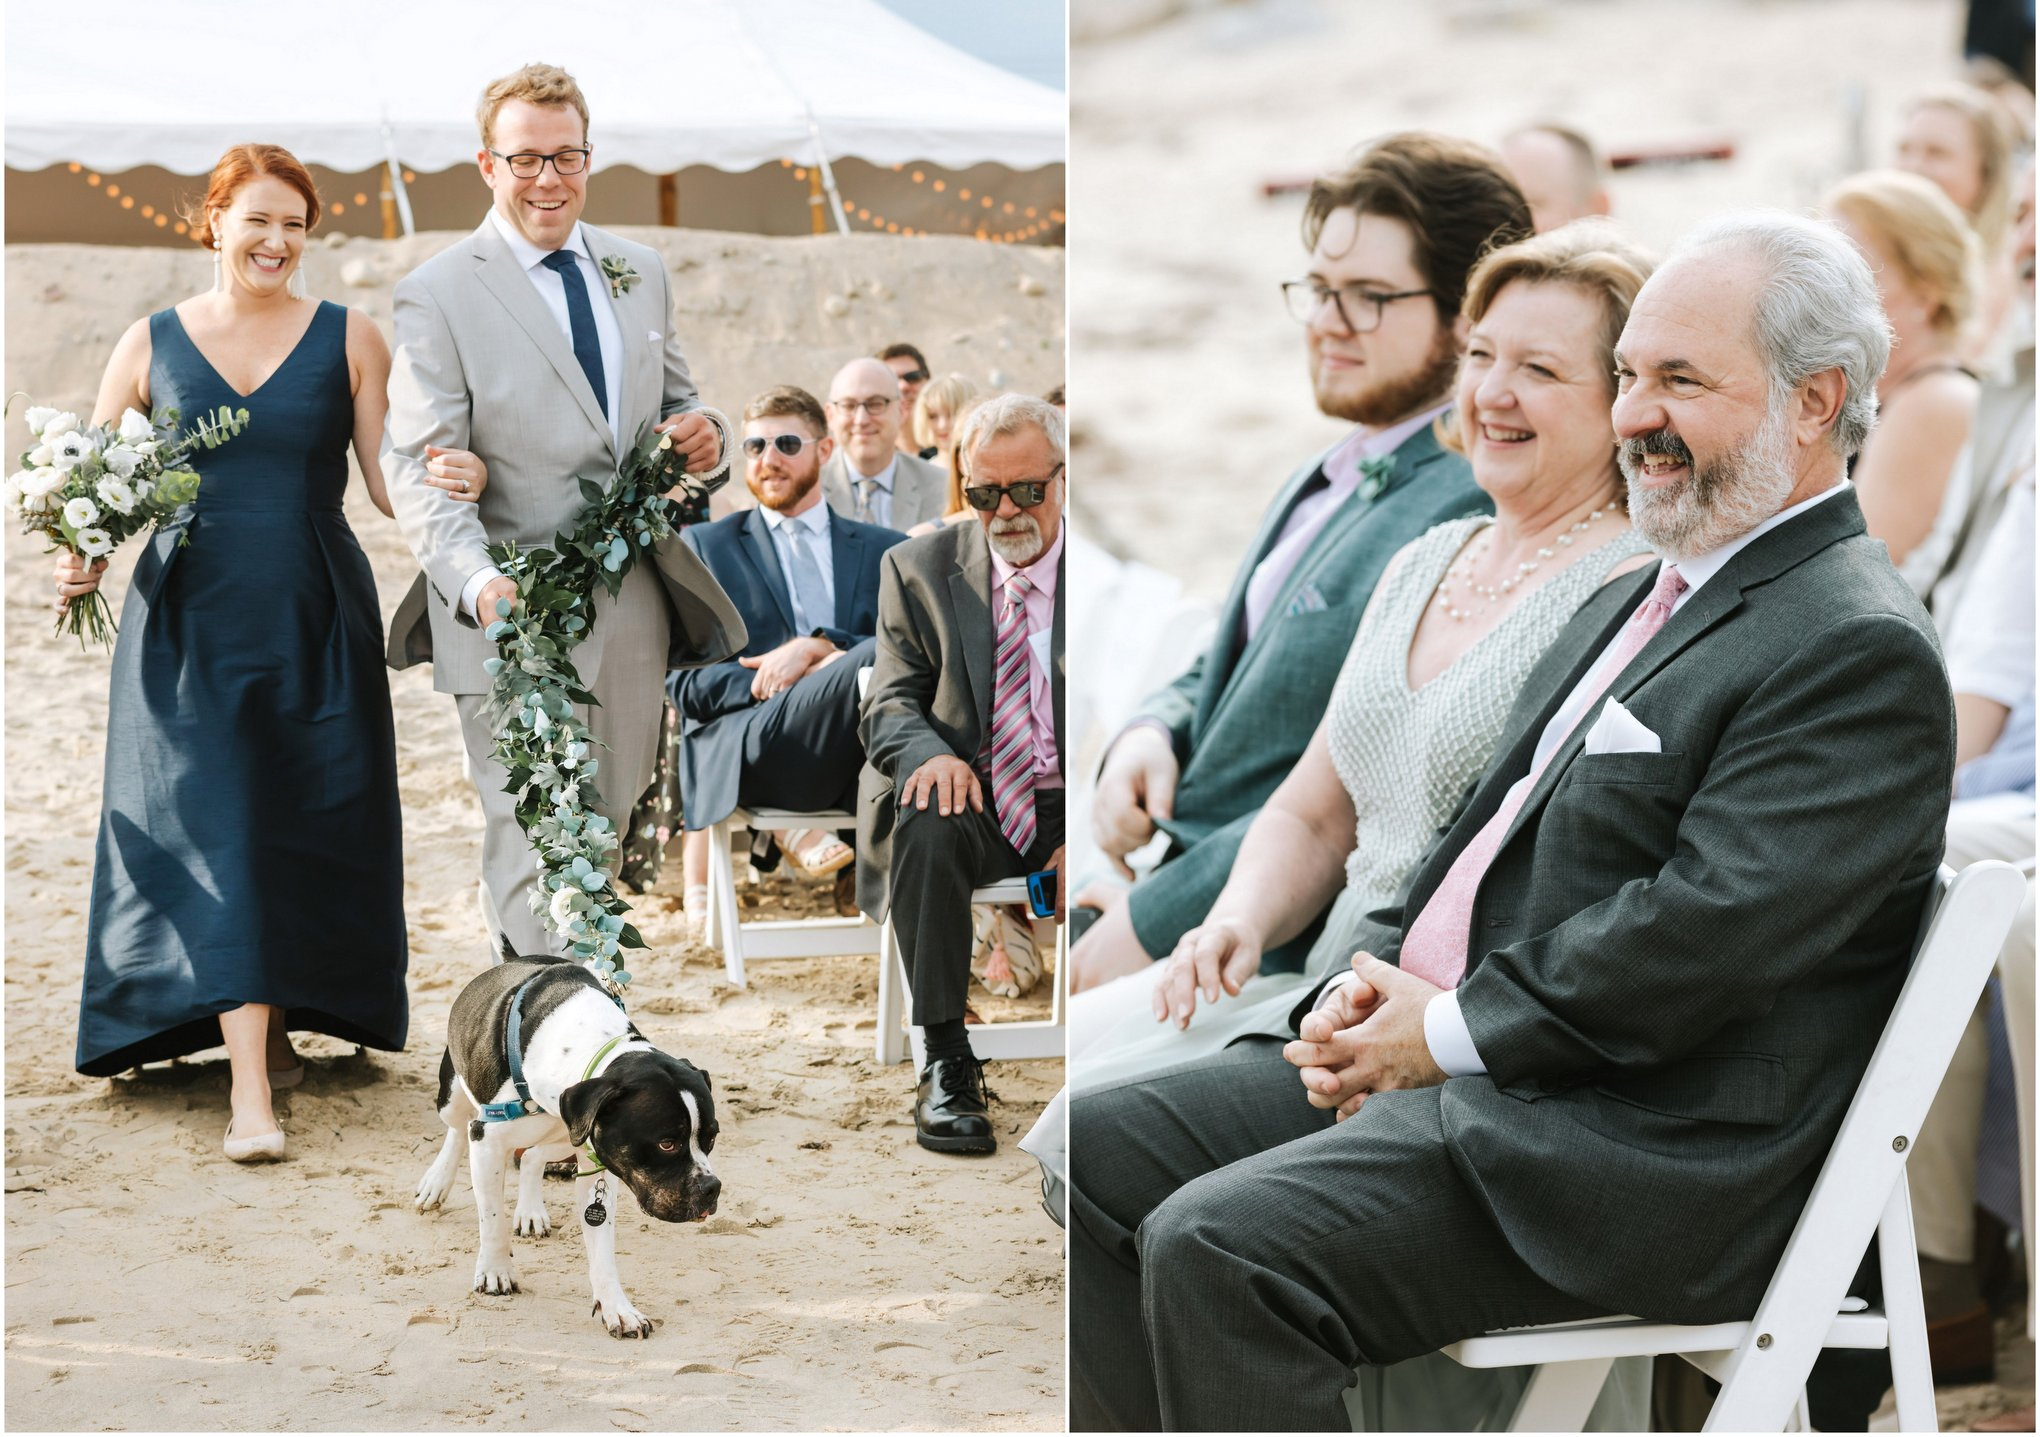 Newport-Wedding-Backyard-Photographer-16.jpg